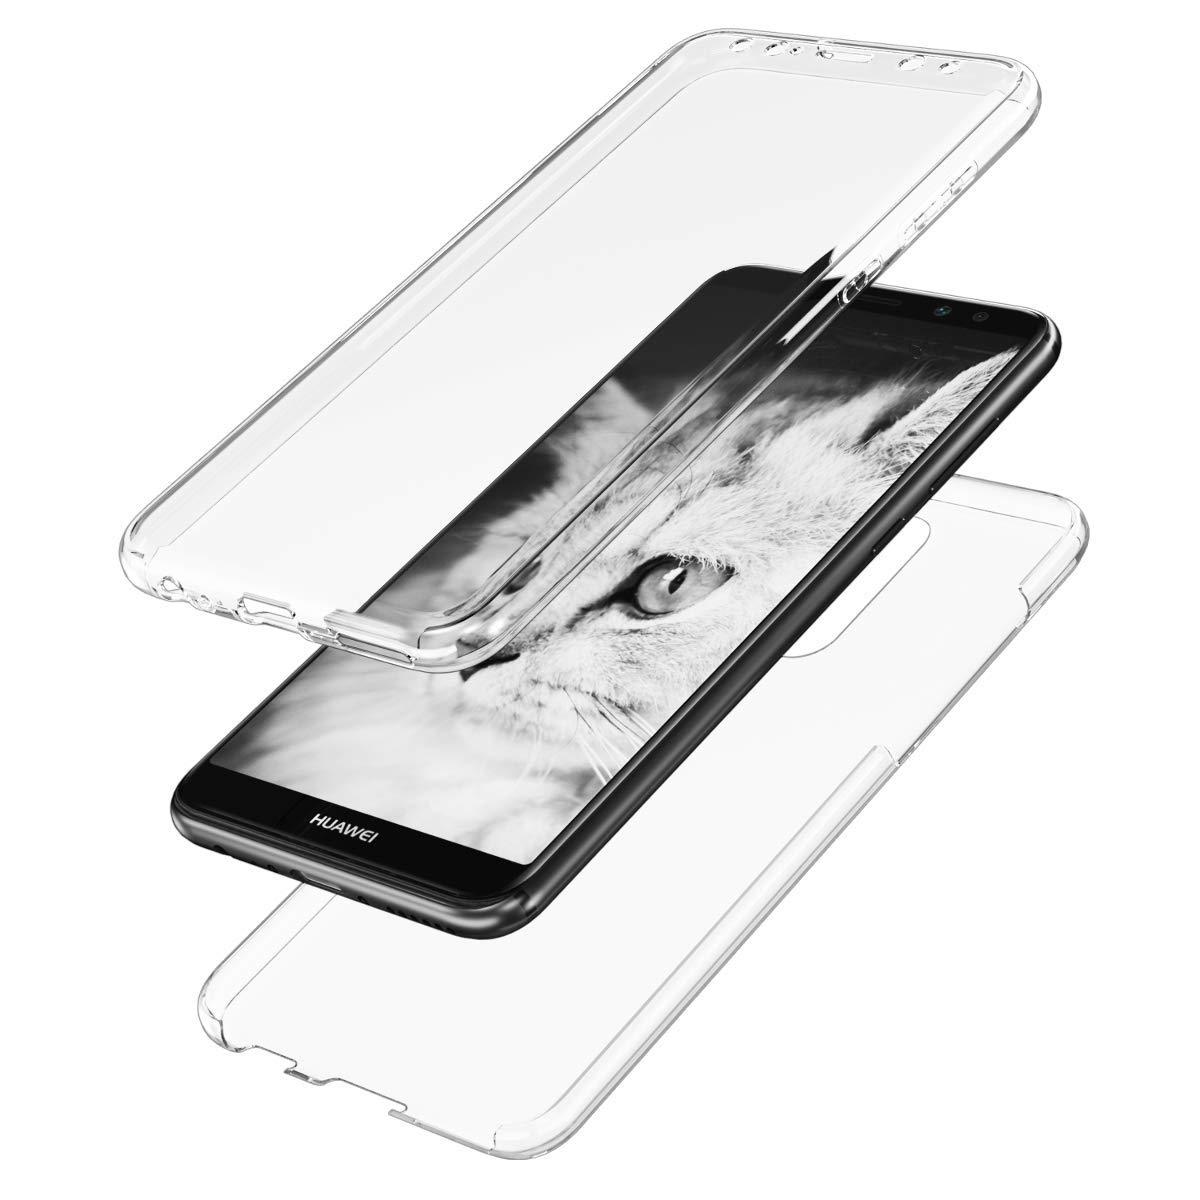 KW Διάφανη Θήκη Σιλικόνης Full Body Huawei Mate 10 Lite - Transparent (46393.03)